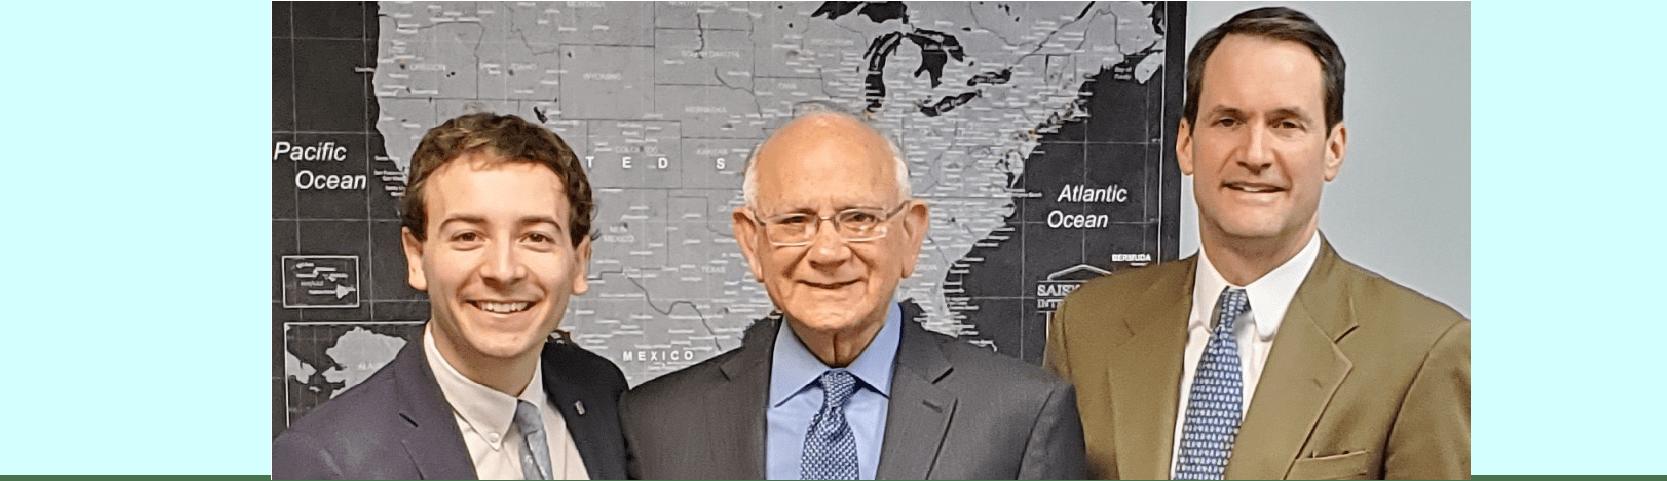 Dr Ramesh Wadhwani and Jim Himes